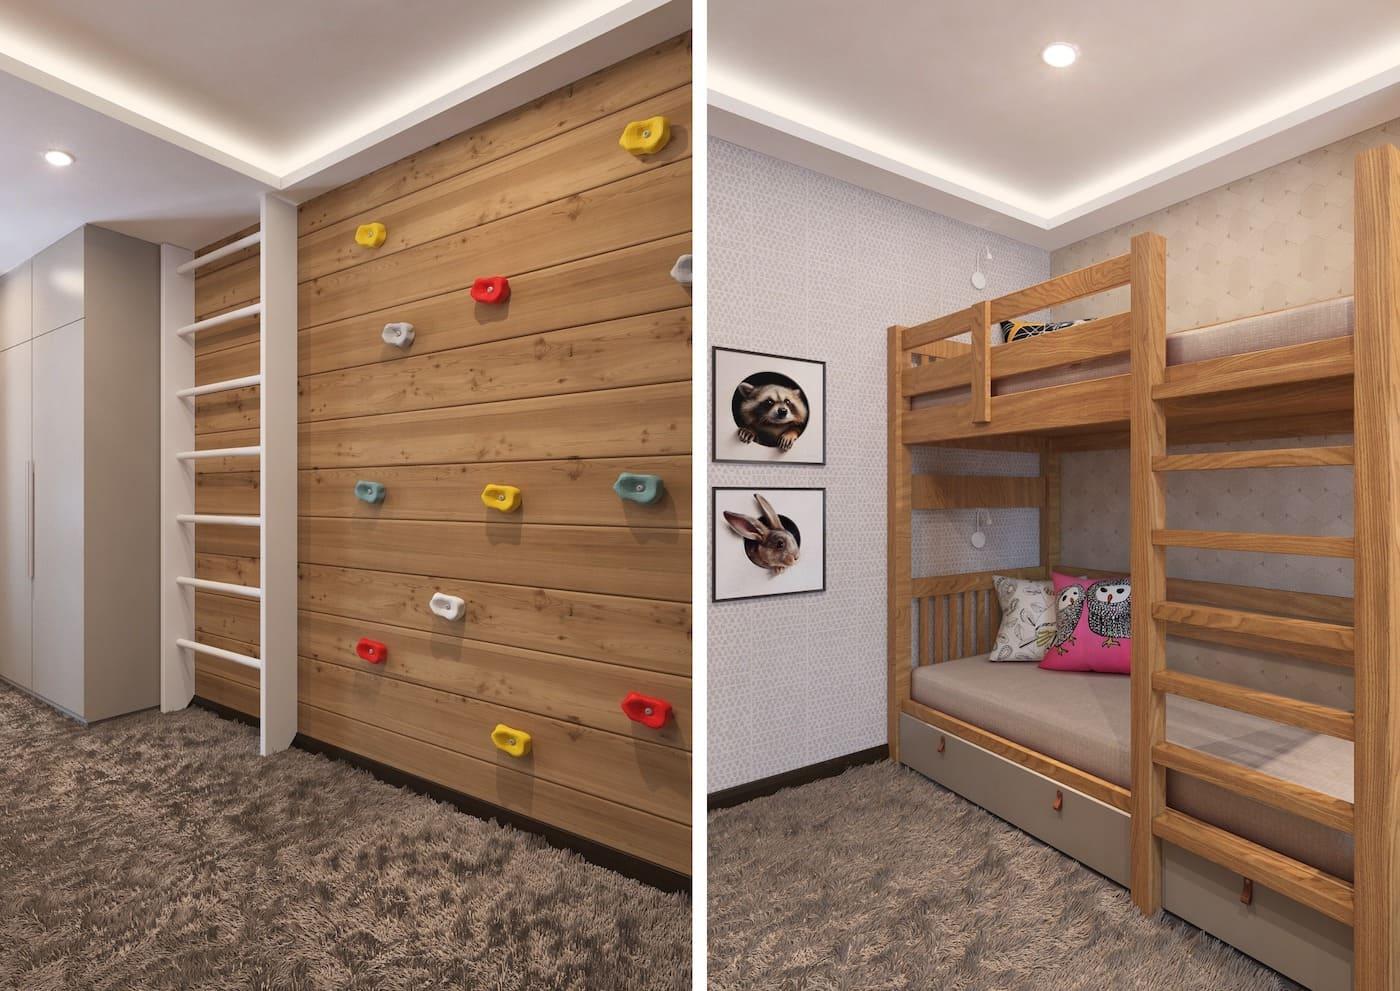 интерьер детской комнаты фото 108